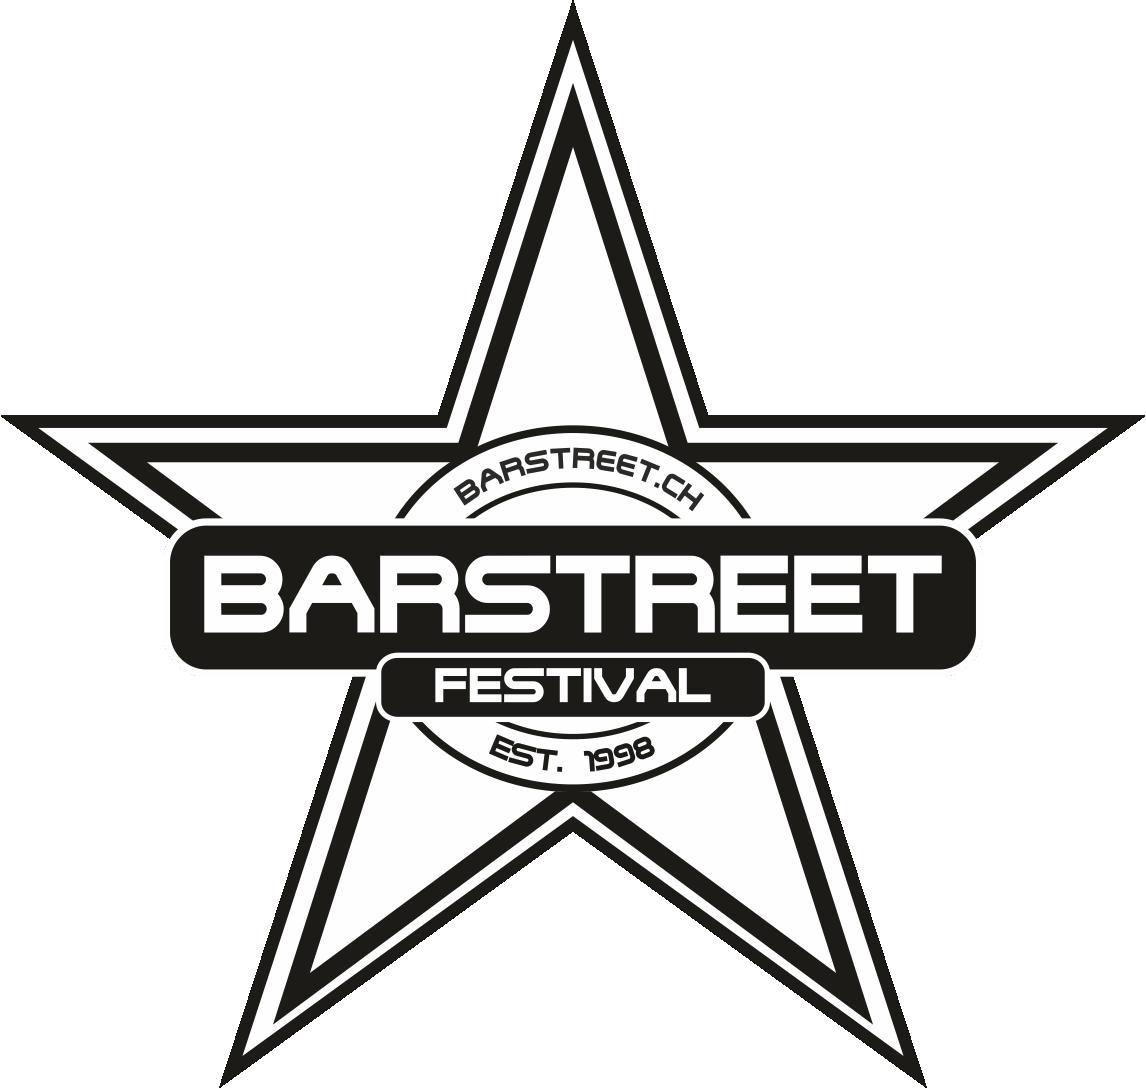 Barstreet Stern 2015